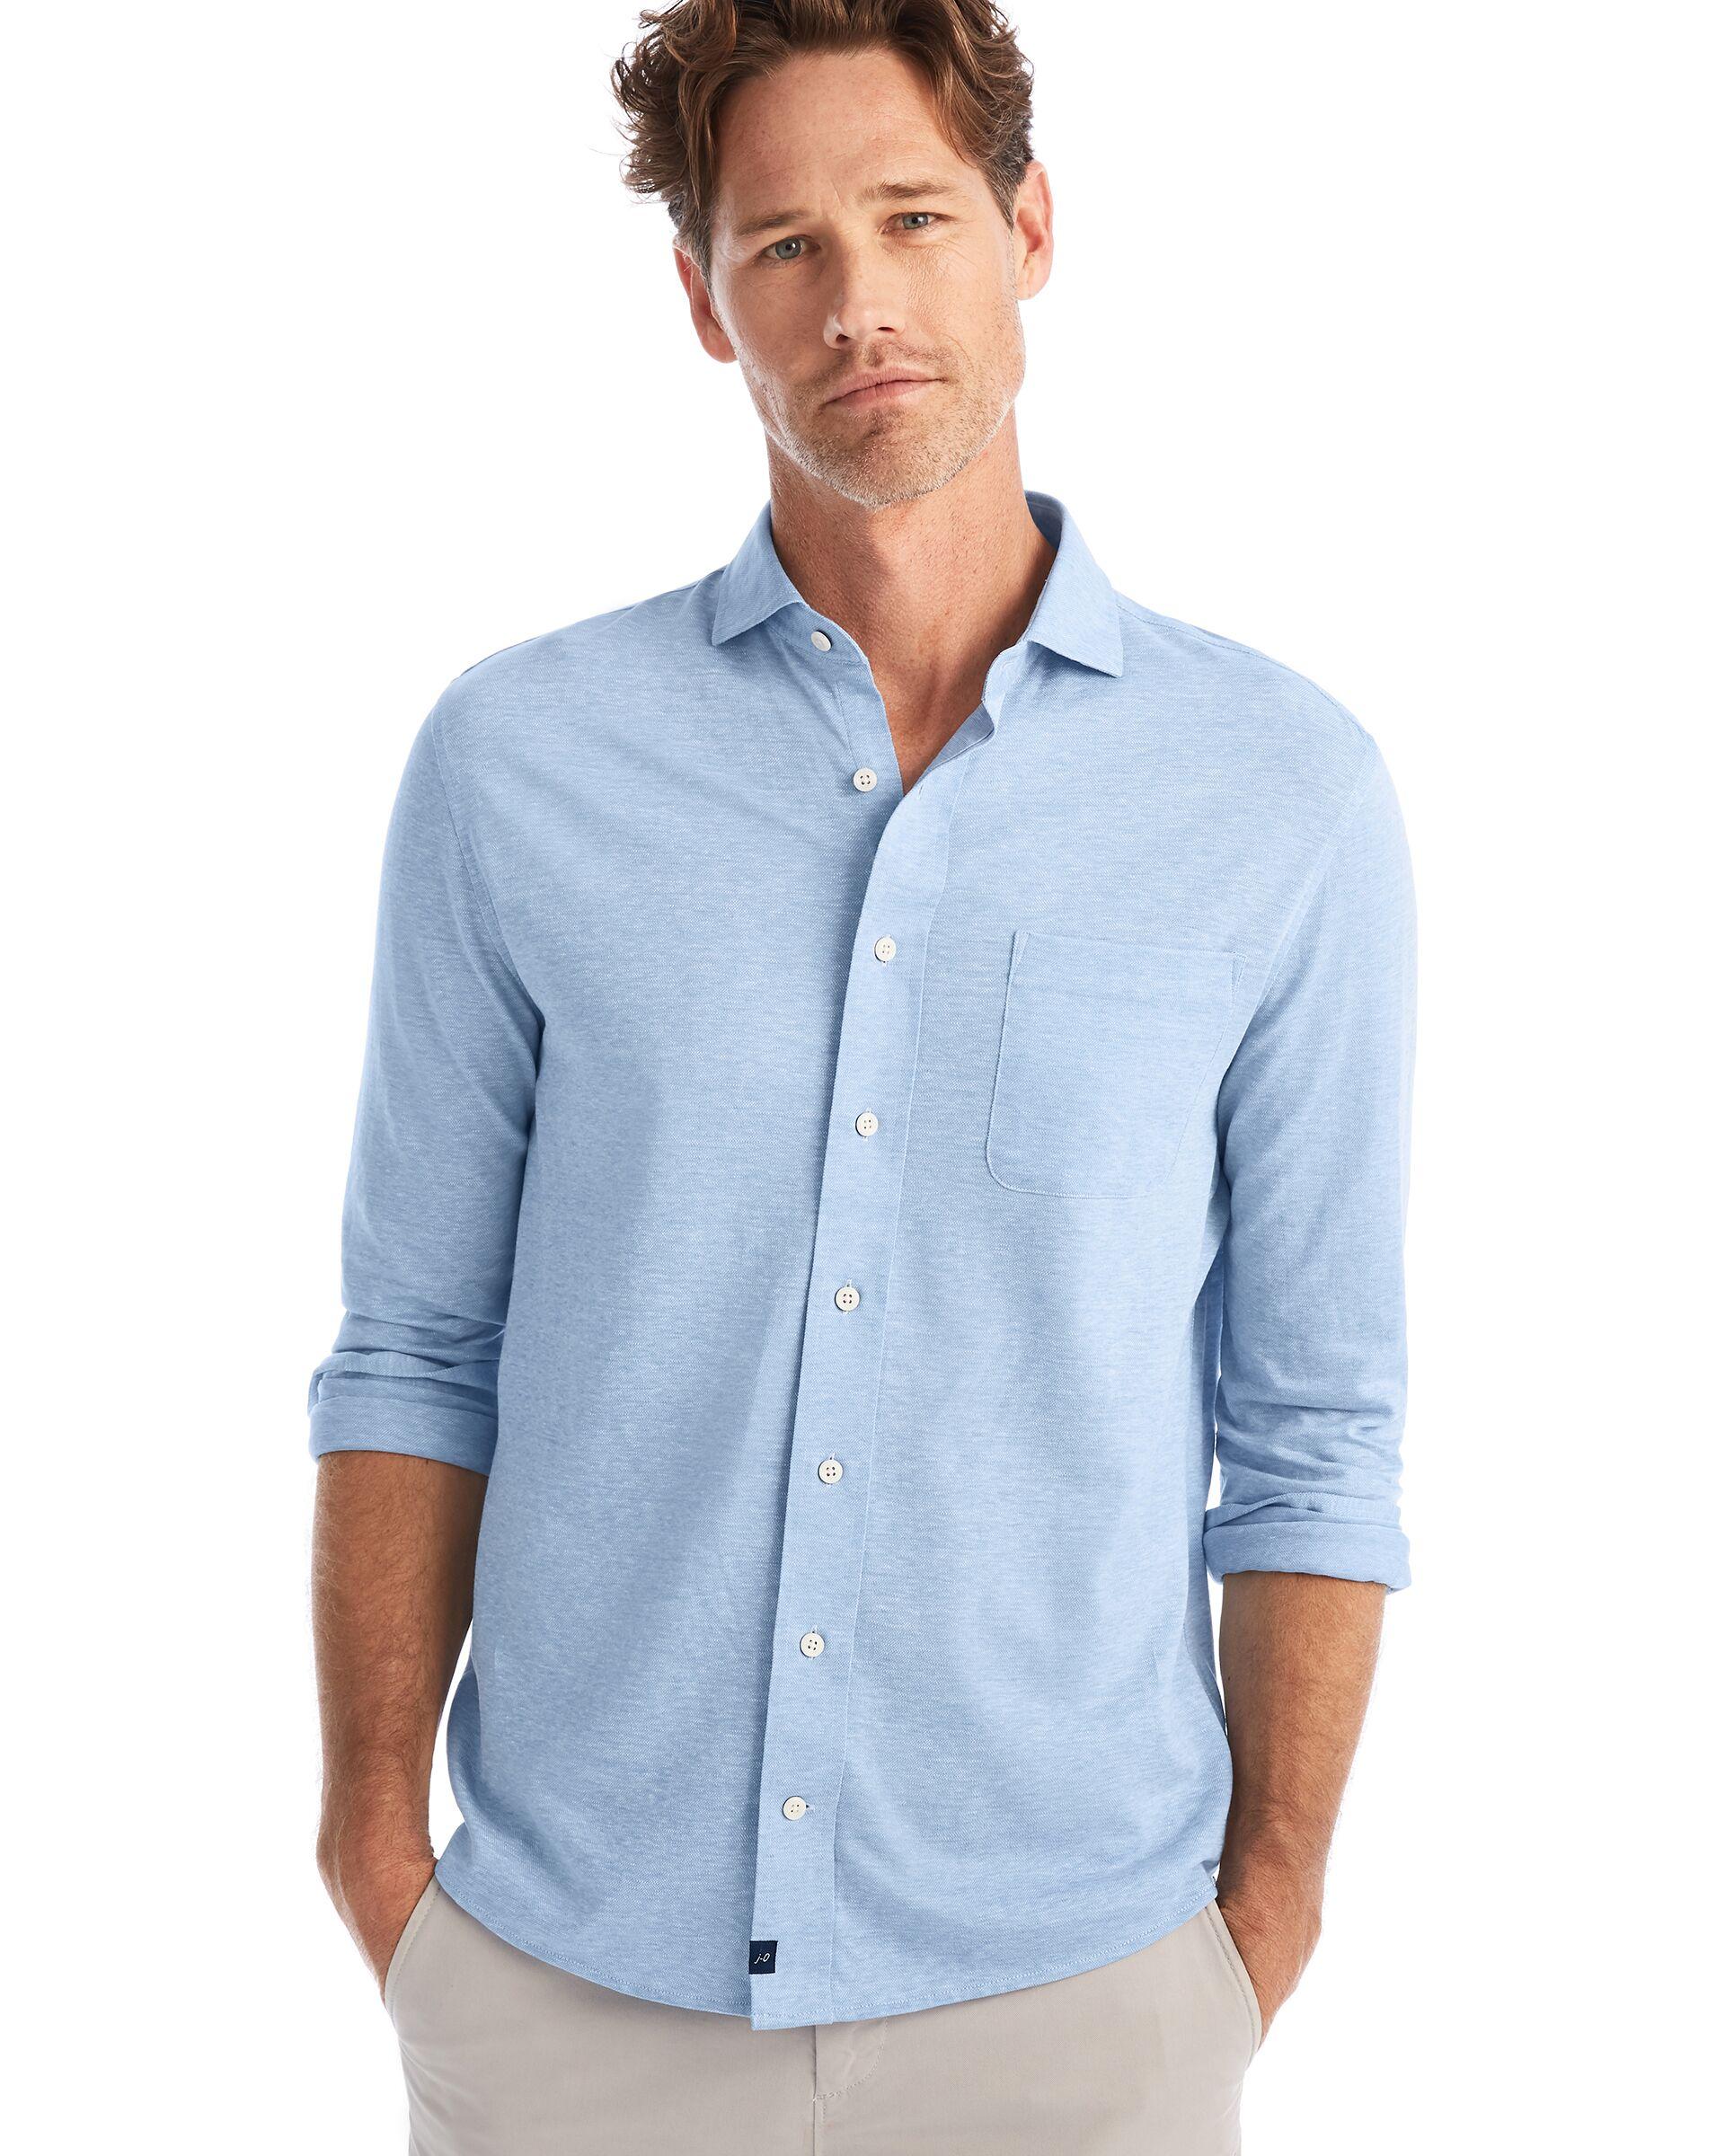 Hector Button Down Shirt (Gulf Blue)